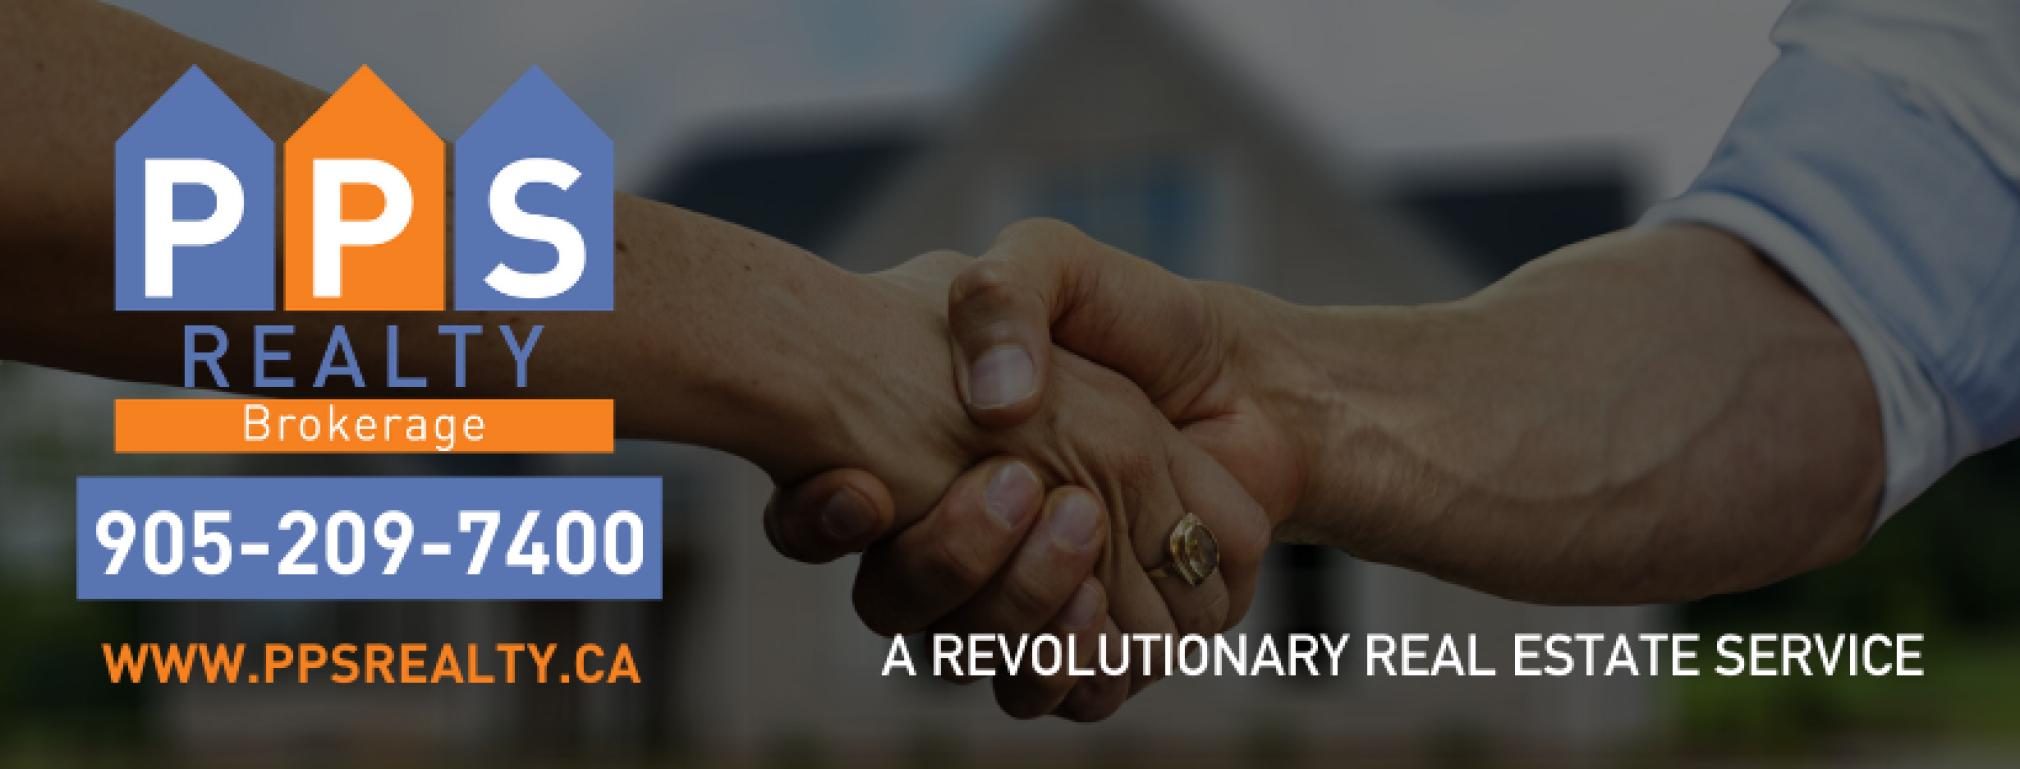 Handshake, PPS Realty Logo - PPS Realty Rebates for Homes in Woodbridge, Ontario